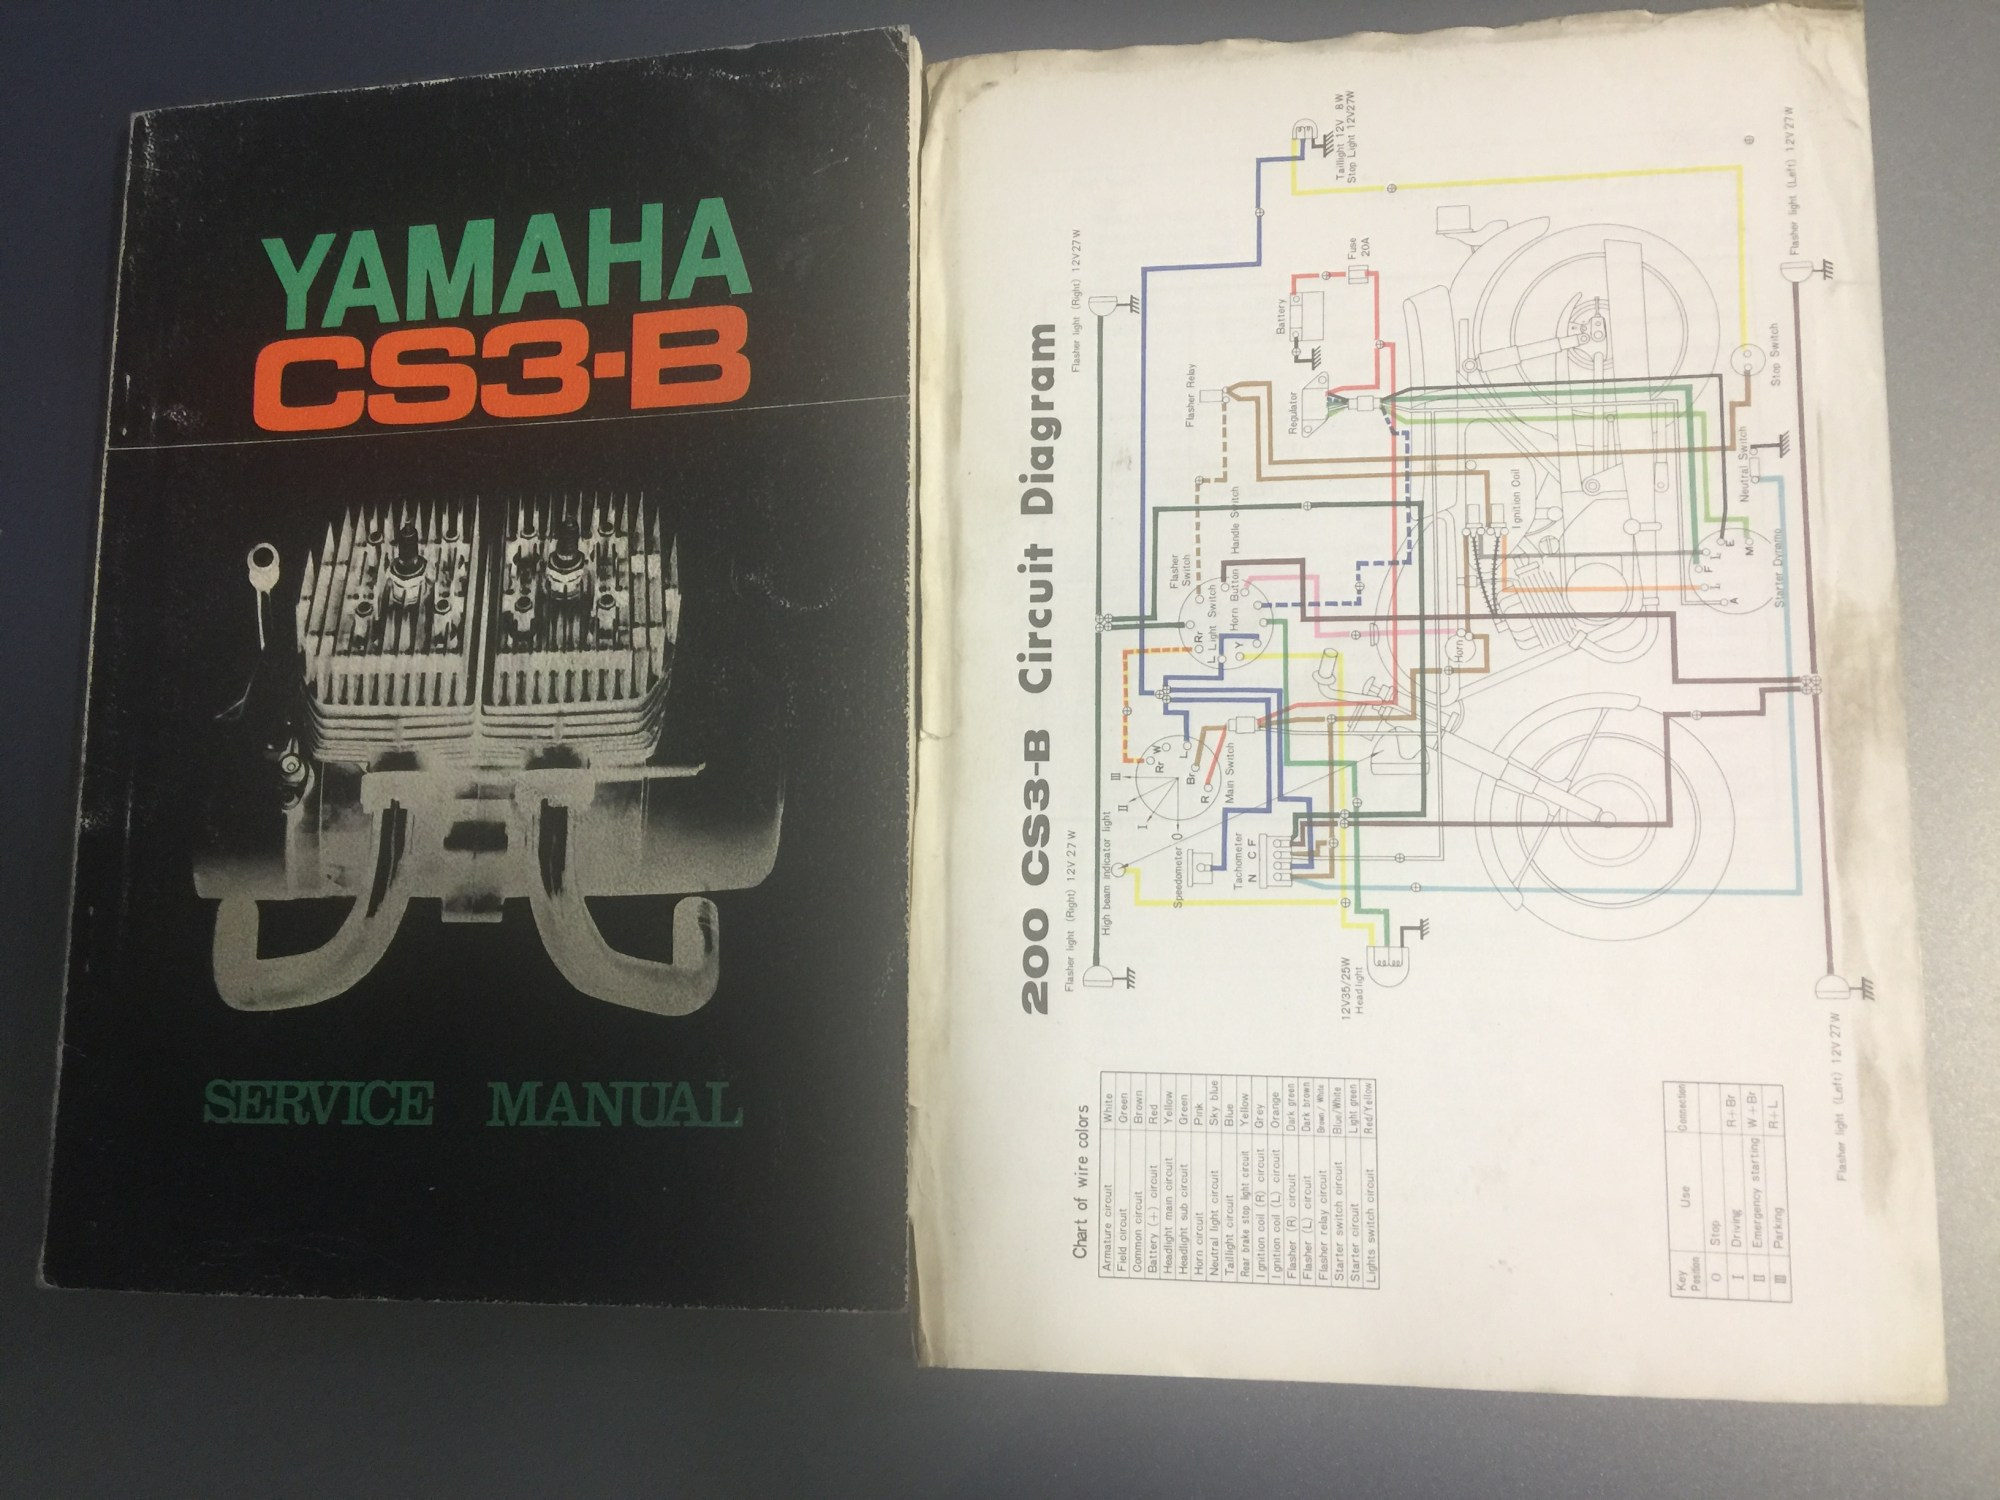 hight resolution of yamaha cs3 wiring diagram wiring diagram worldyamaha cs3 wiring diagram 1